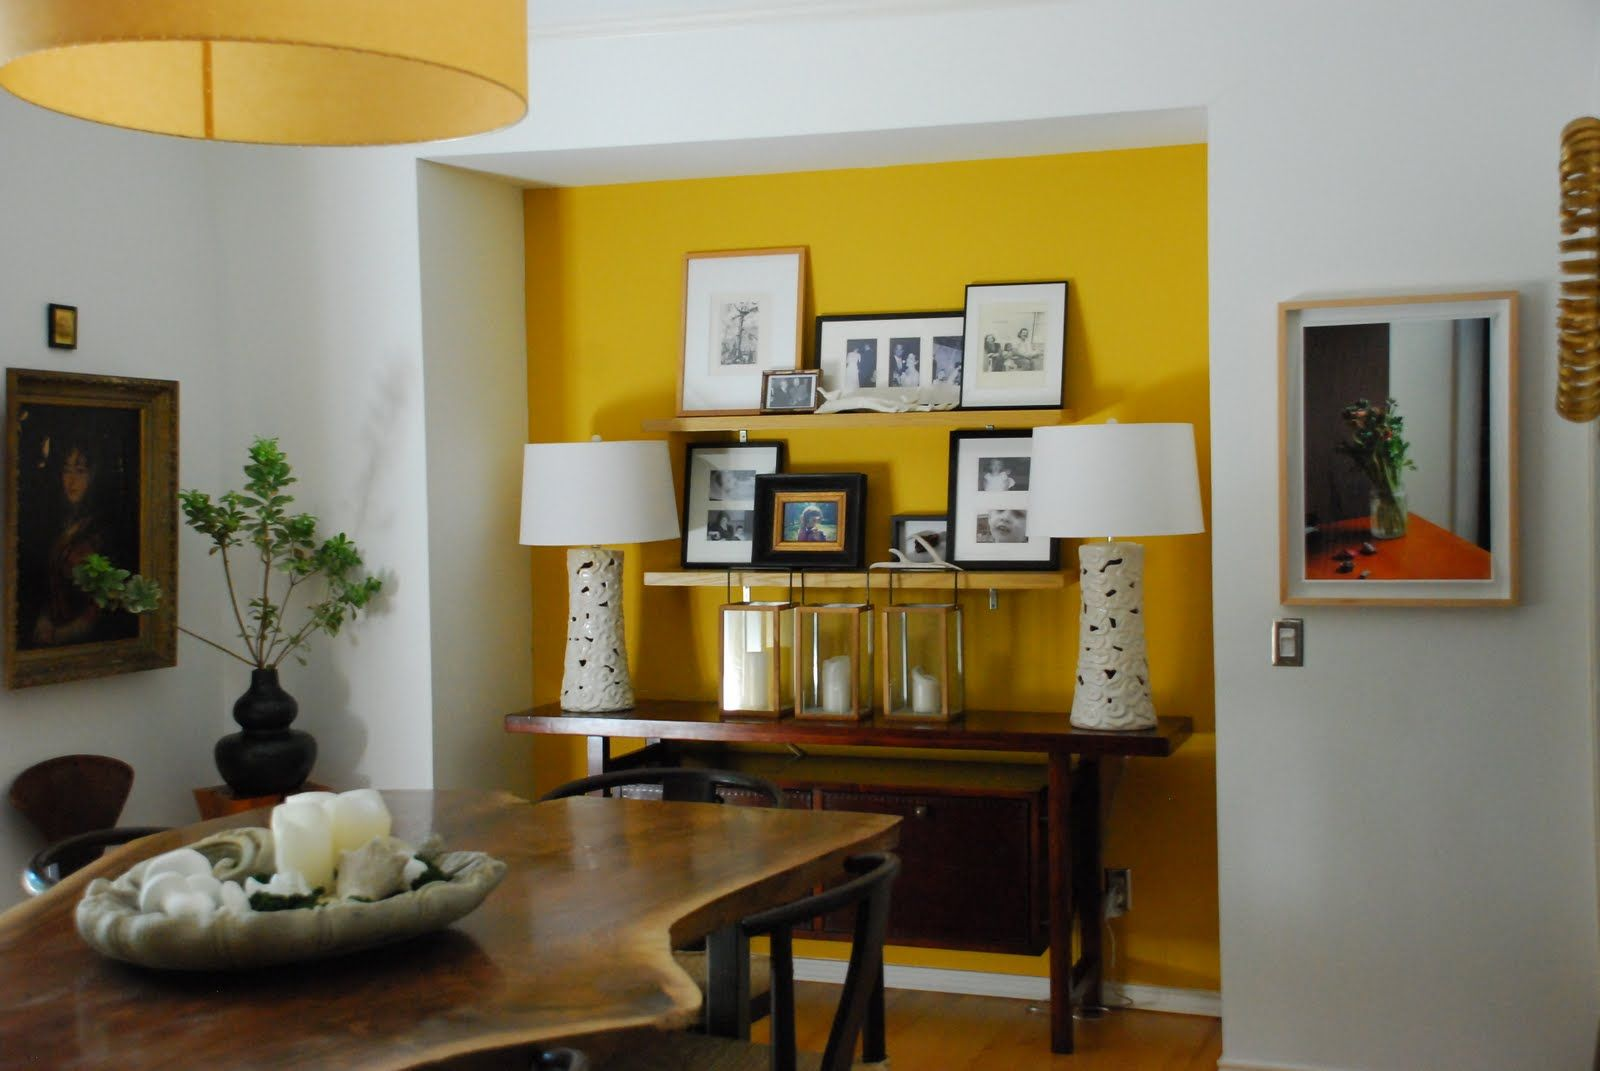 Yellow Wall Love Rustic Wall Mirrors Oversized Wall